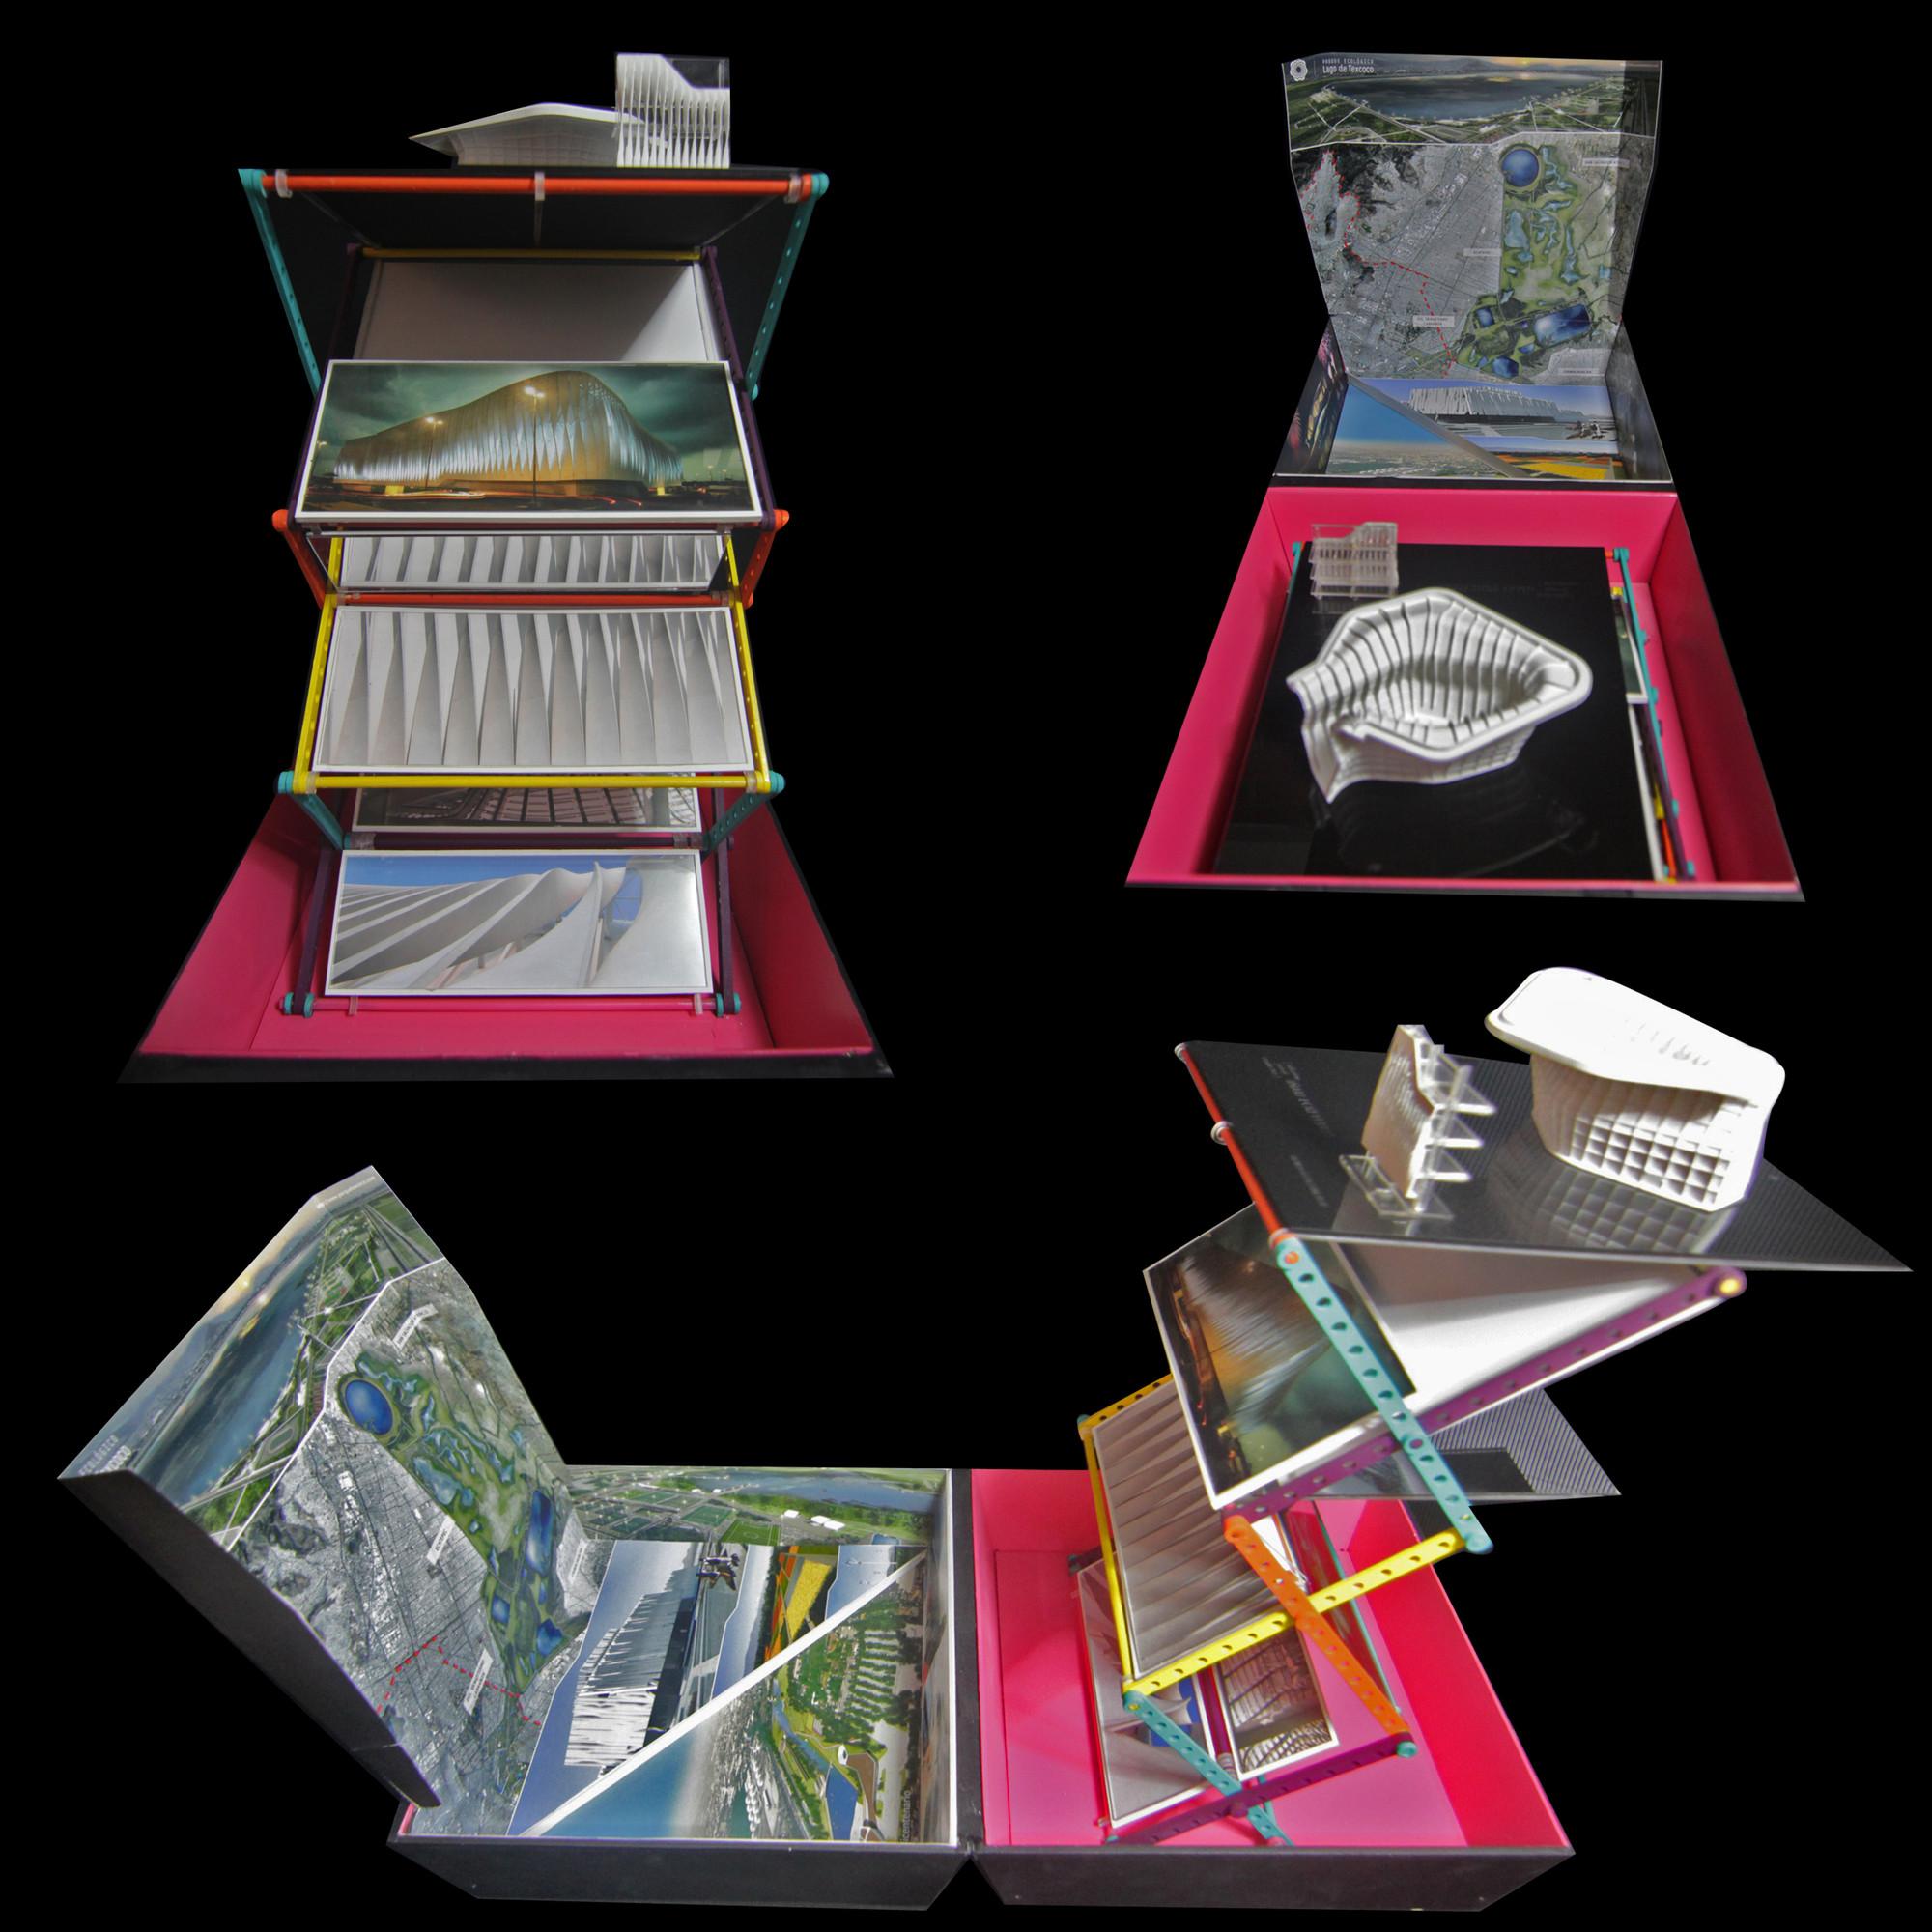 Pieza-Caja de Iñaki Echeverría